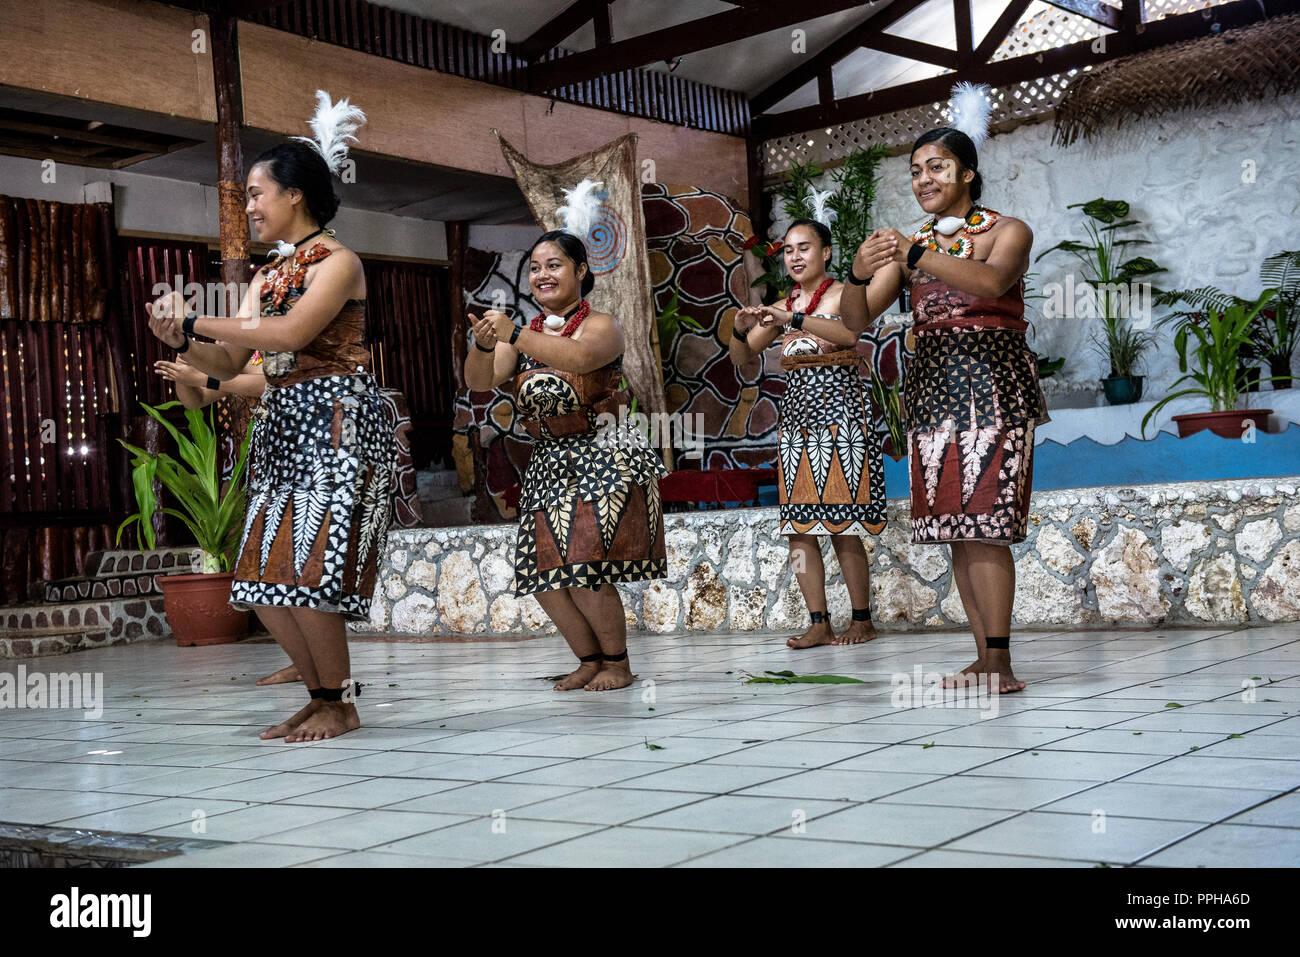 Nuku'Alofa, Tonga -- March 10, 2018. Female dancers in native garb perform a traditional Tonganese dance. - Stock Image